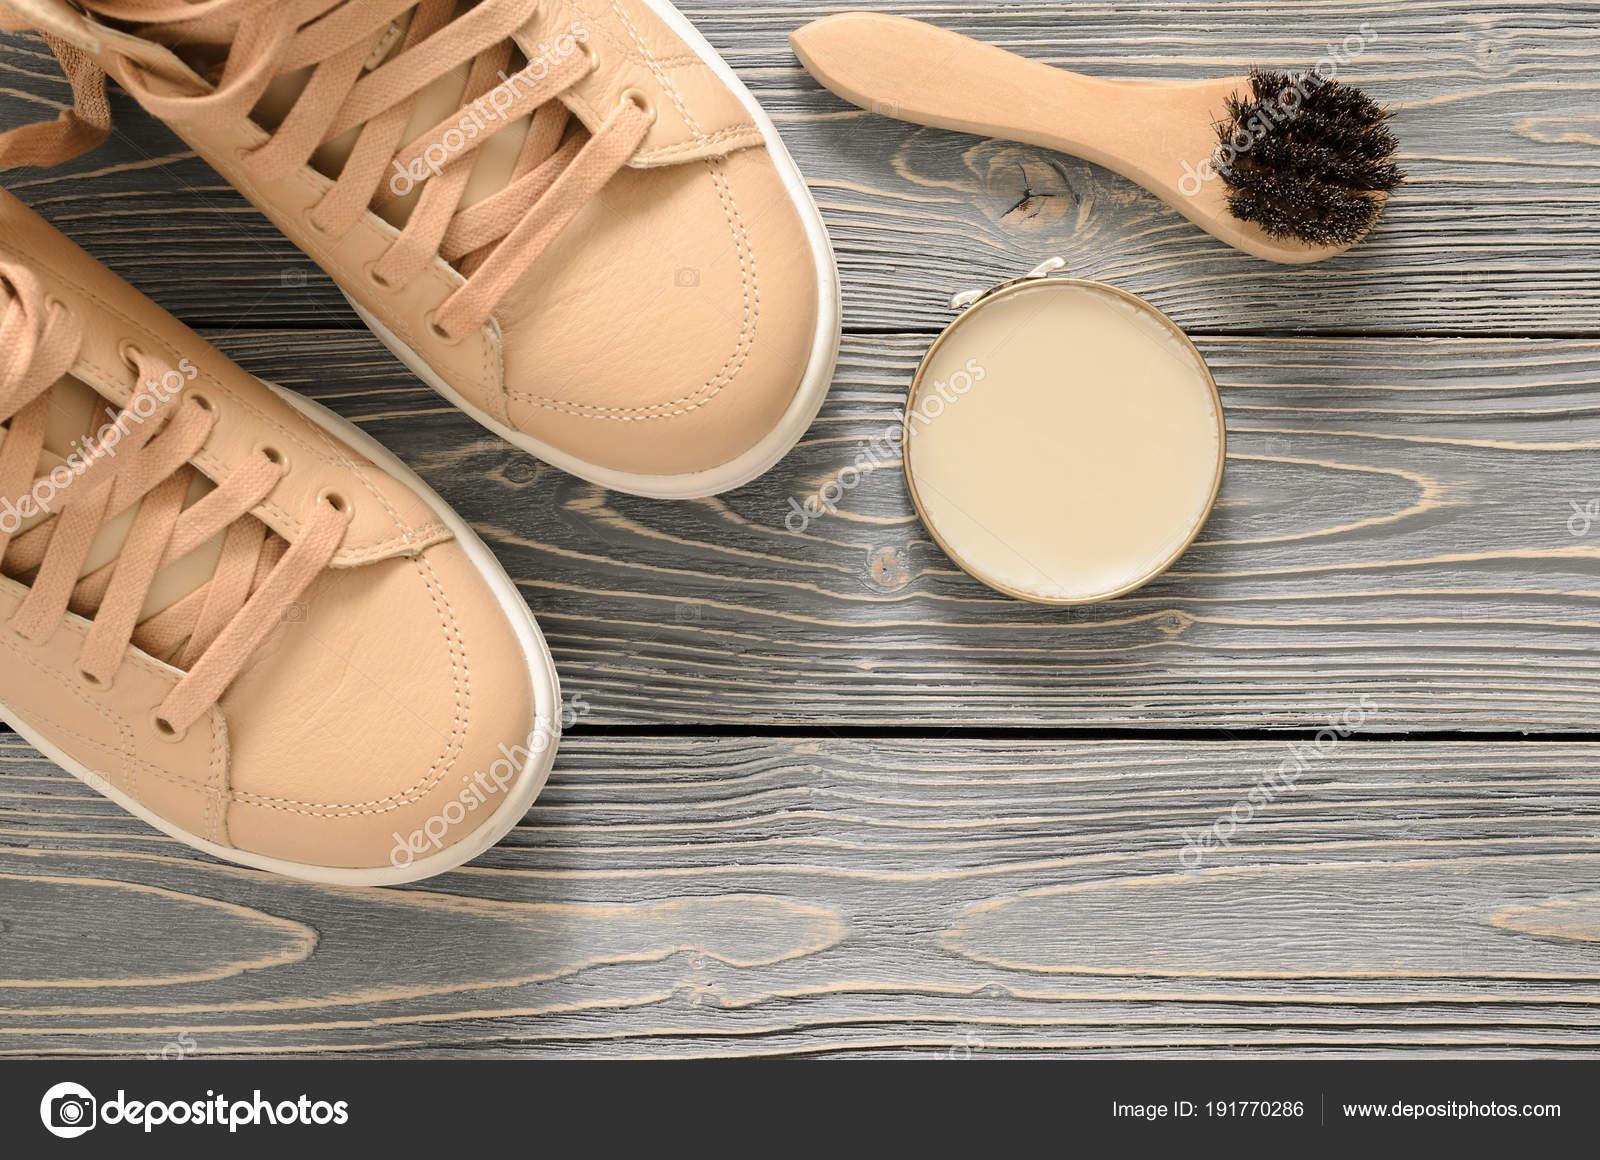 Chaussure Care Kit cr猫me brosse en crin chamois锛?cire vernis cr猫me Kit neutre b3f422